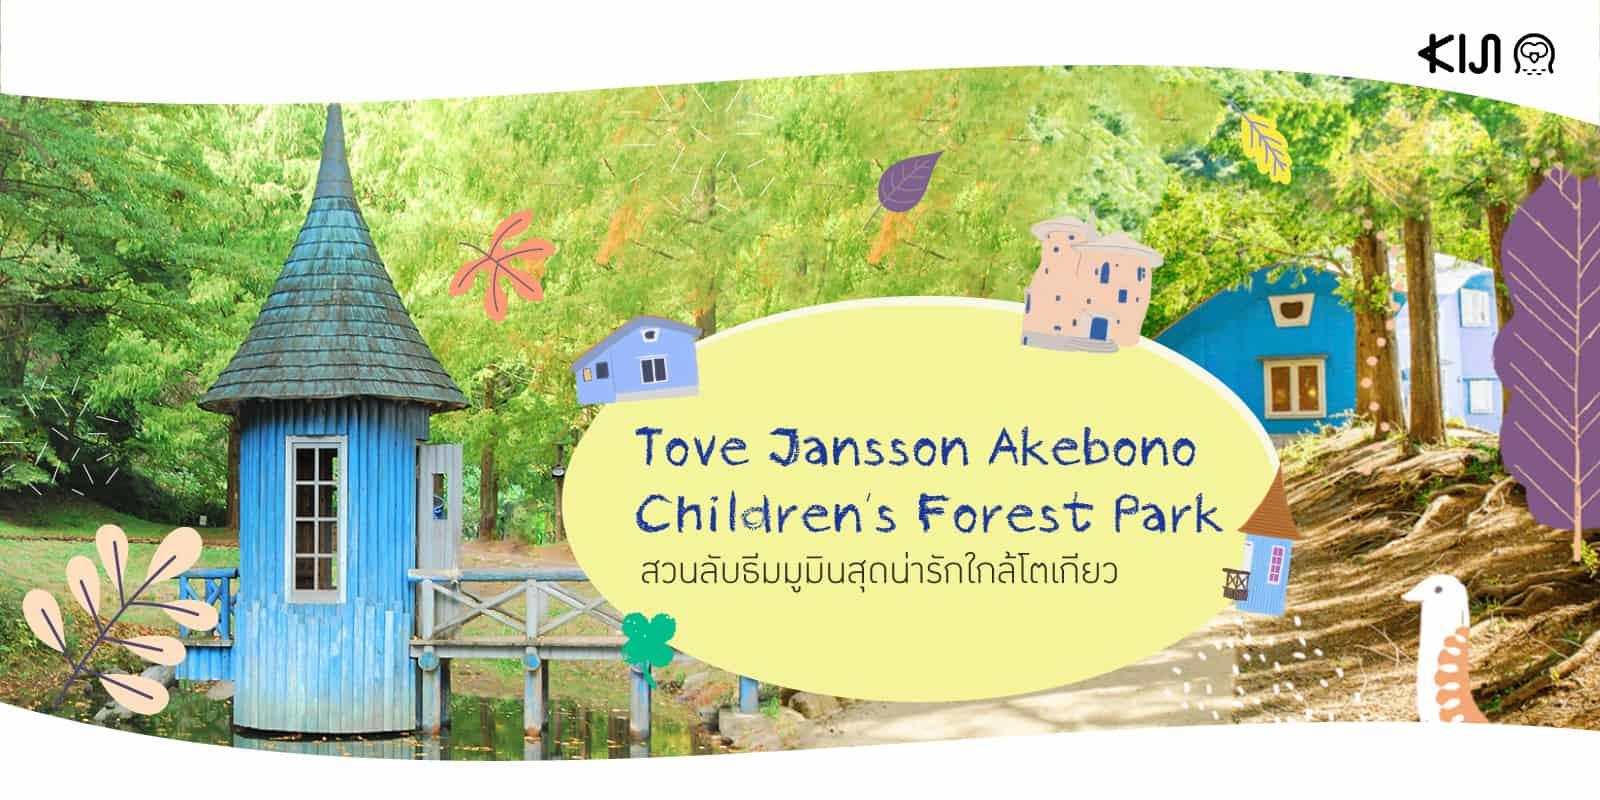 Tove Jansson Akebono Children's Forest Park